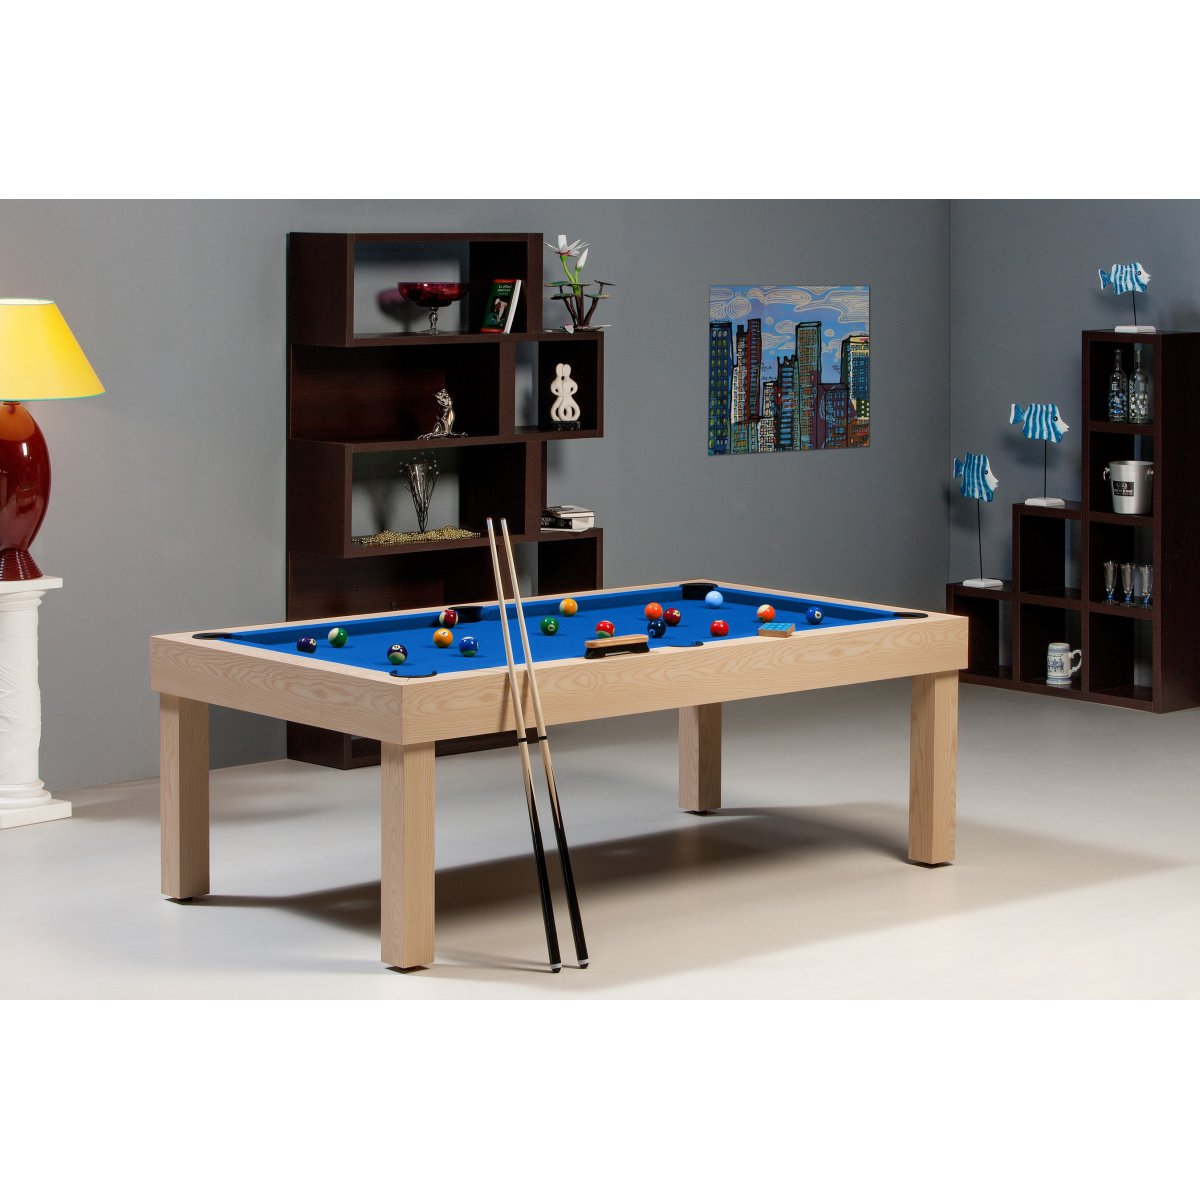 billard americain plateau de jeu ardoise table en ch ne. Black Bedroom Furniture Sets. Home Design Ideas